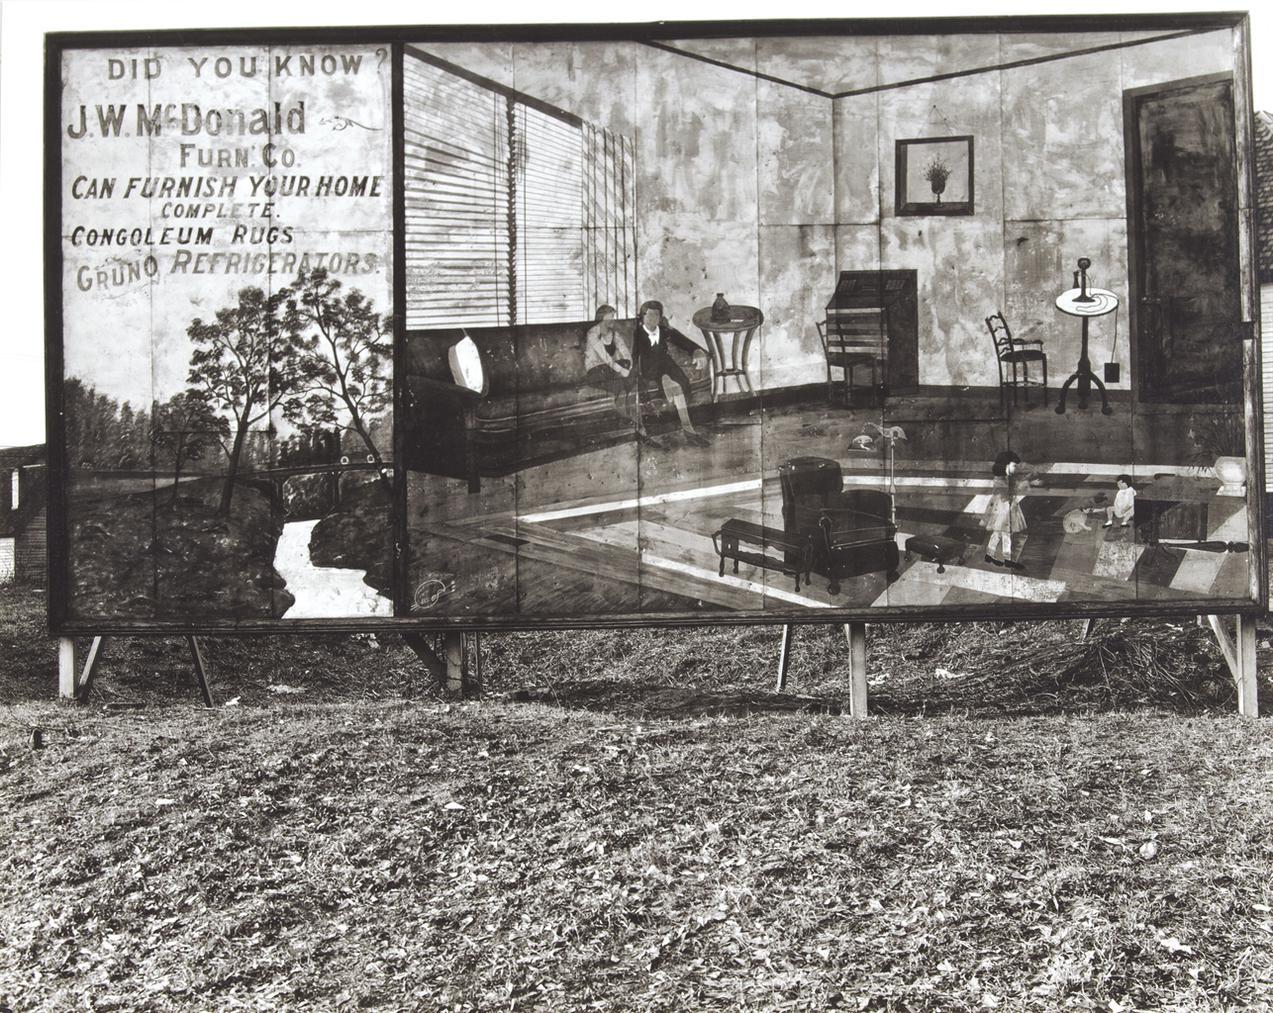 Walker Evans-Roadside Furniture Store Sign Near Birmingham, Alabama-1936